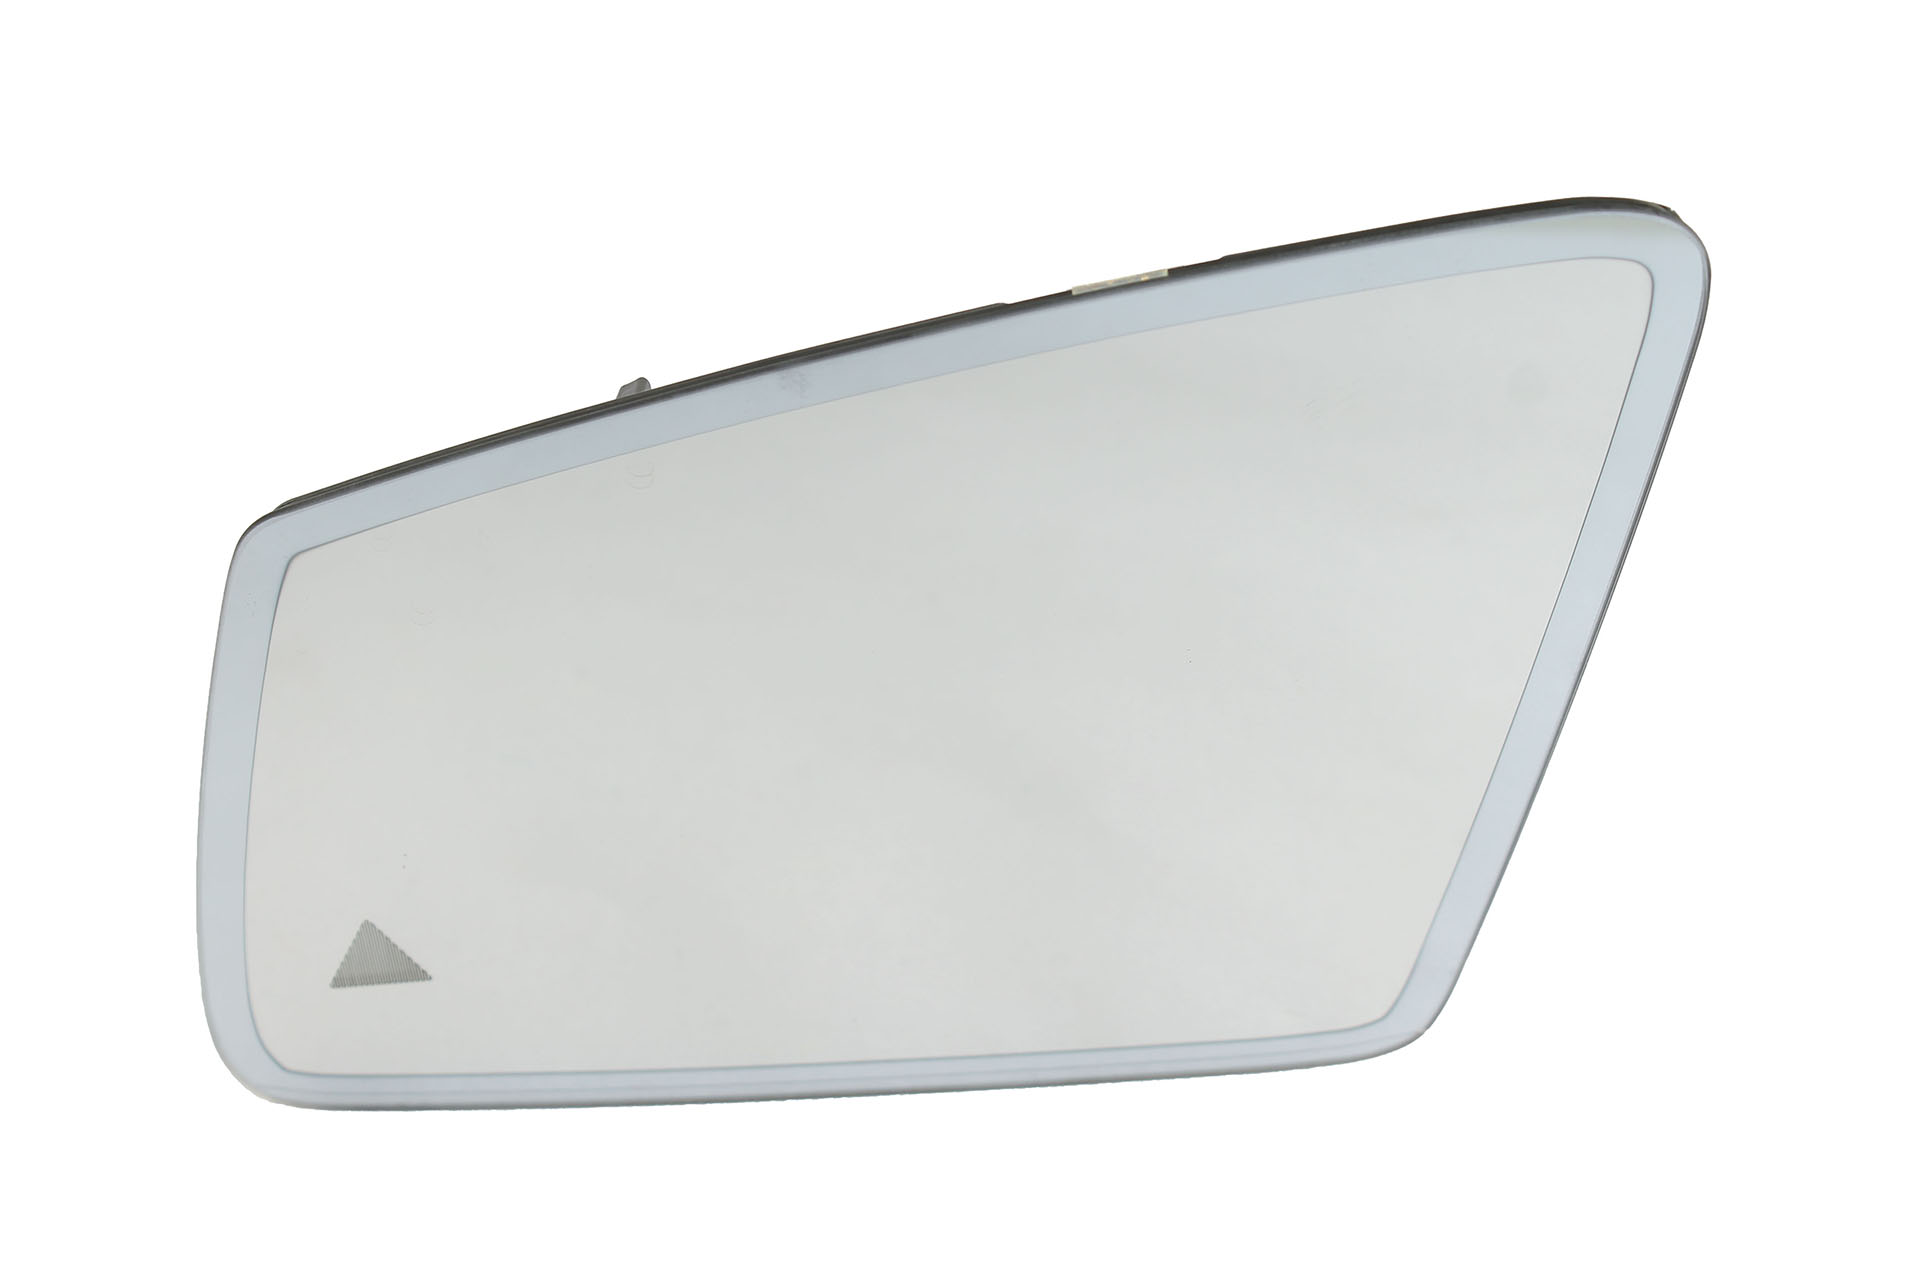 mb gtc b2c shop au enspiegelglas li online kaufen. Black Bedroom Furniture Sets. Home Design Ideas